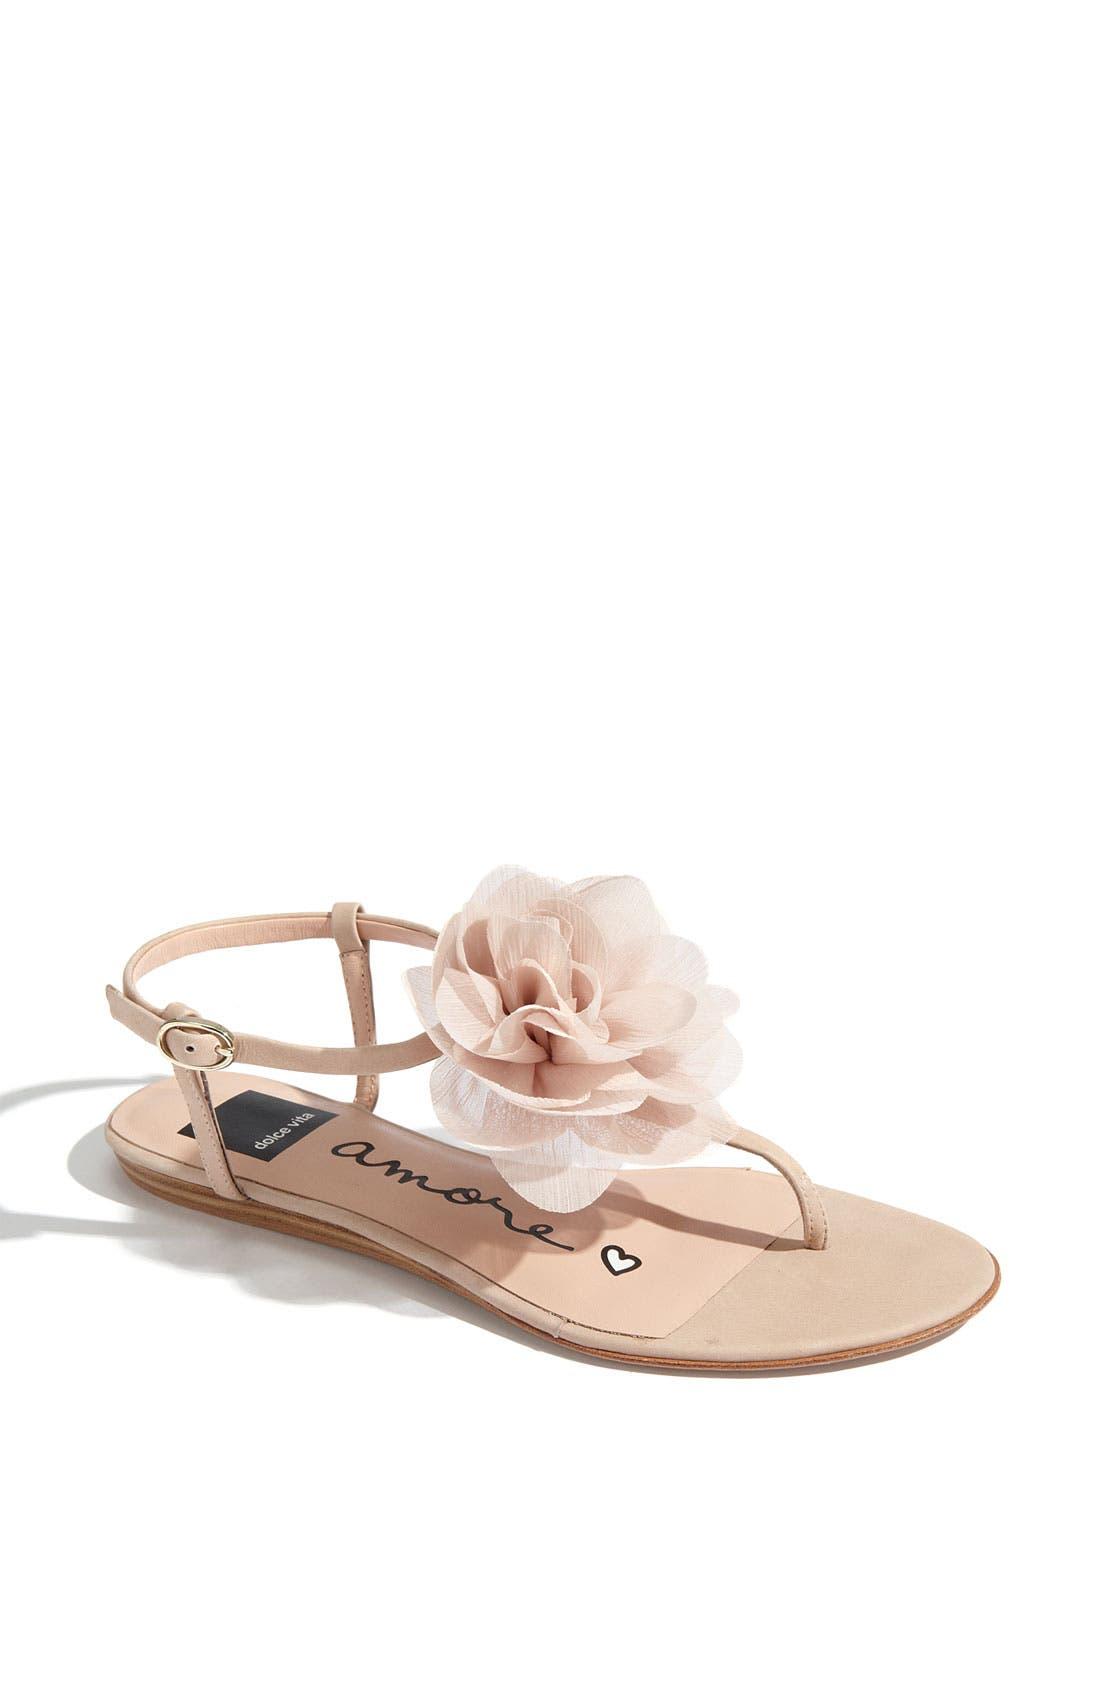 Main Image - Dolce Vita 'Felice' Sandal